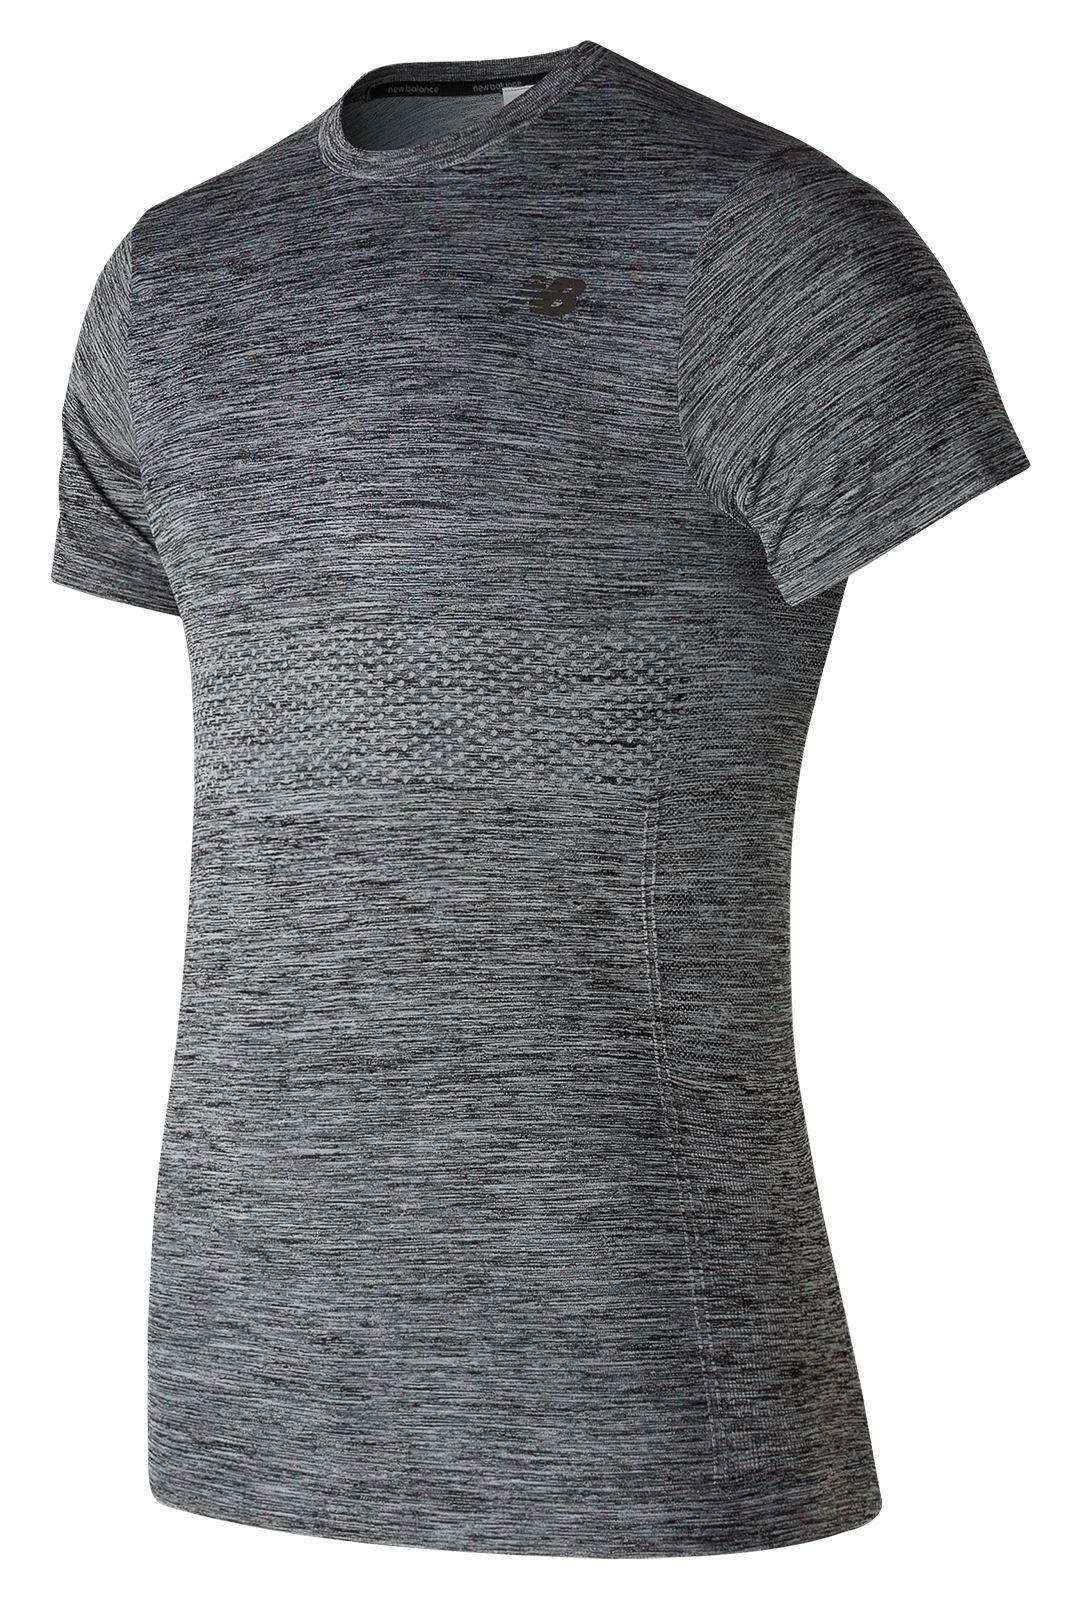 NB M4M Seamless Short Sleeve, Athletic Grey